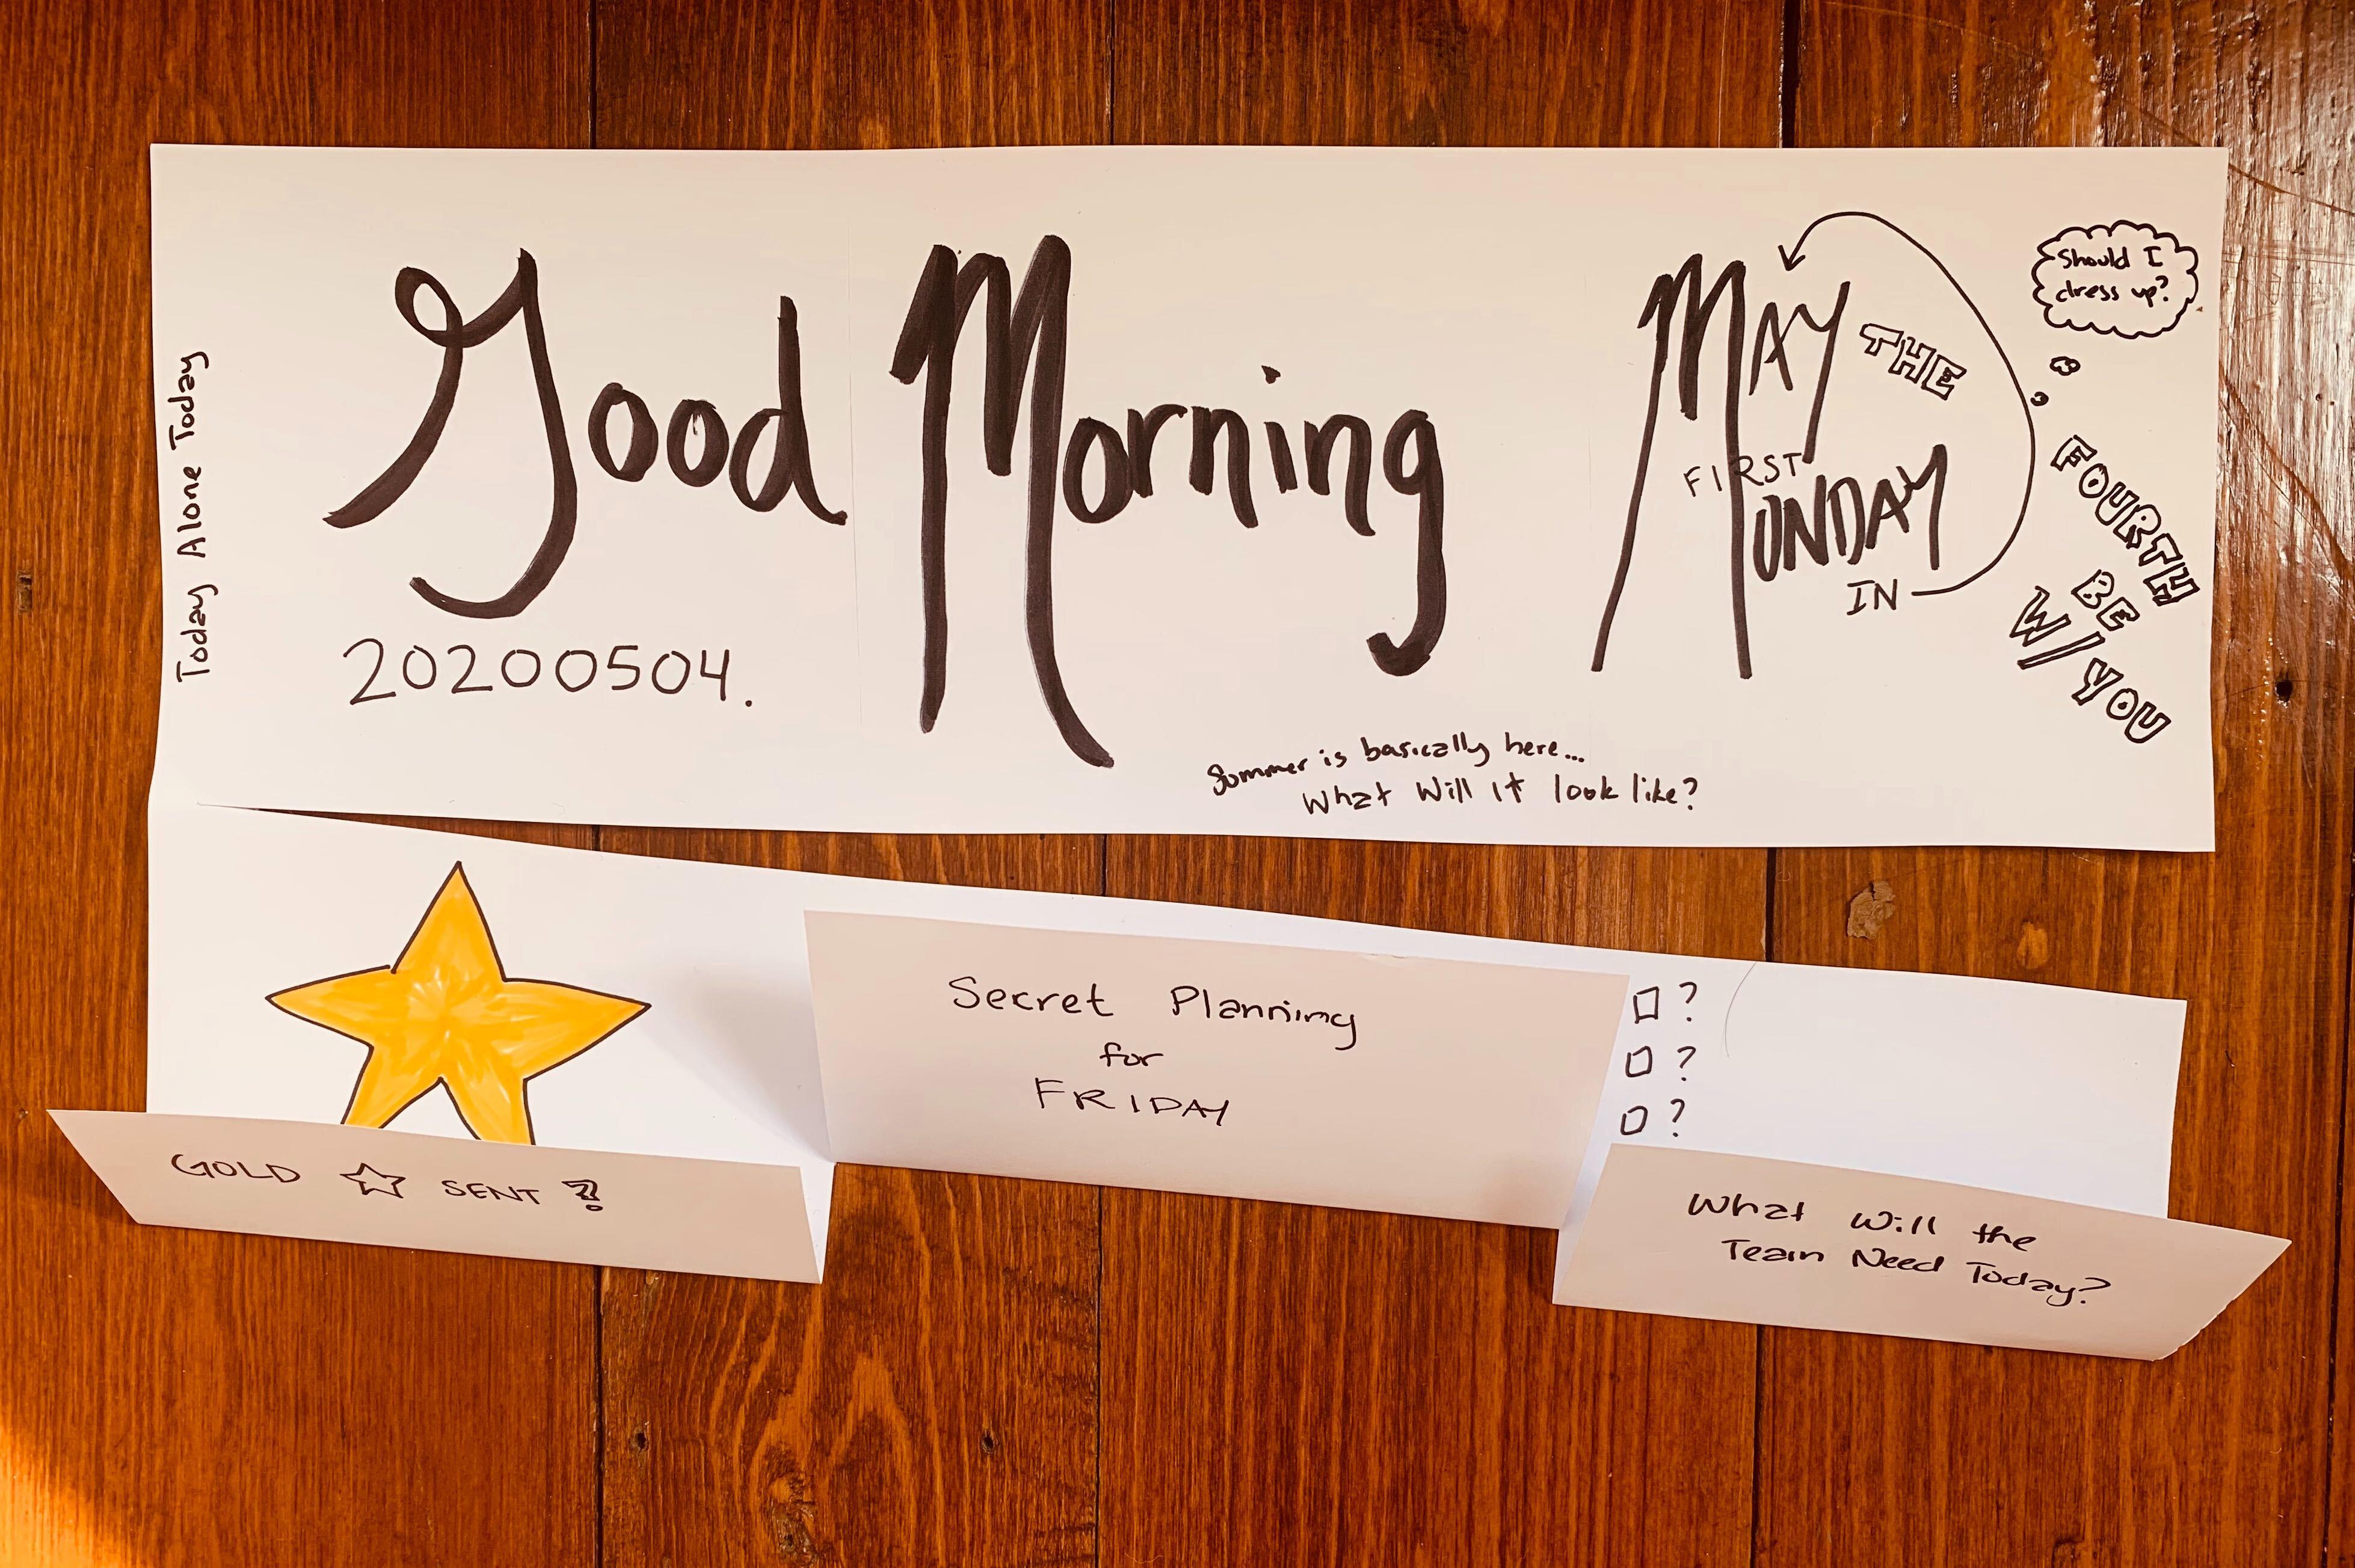 Jordan's morning tasks